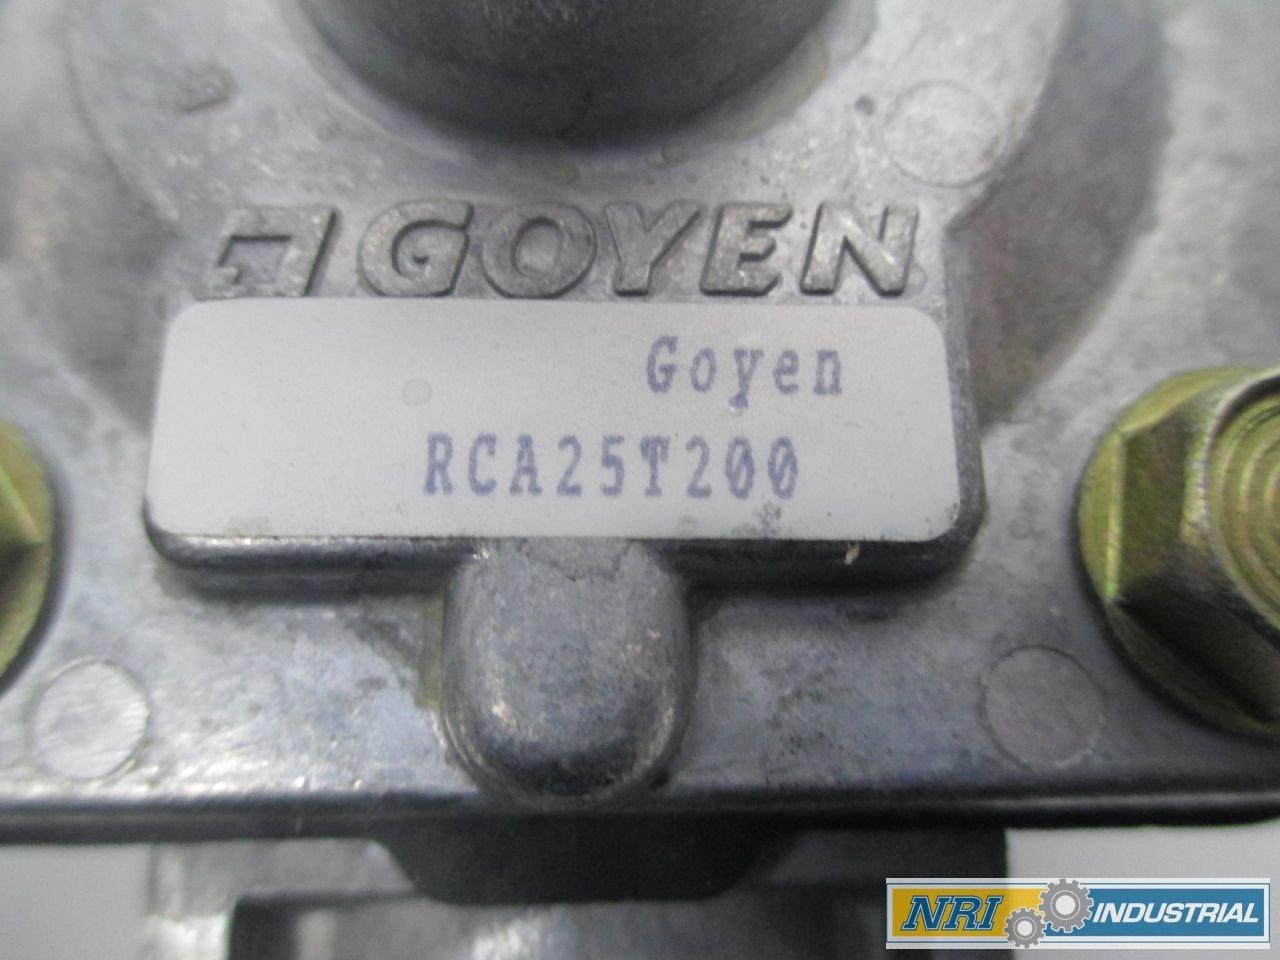 NEW GOYEN RCA25T200 125PSI THREADED 1IN NPT DIAPHRAGM VALVE D283375 by Goyen (Image #5)